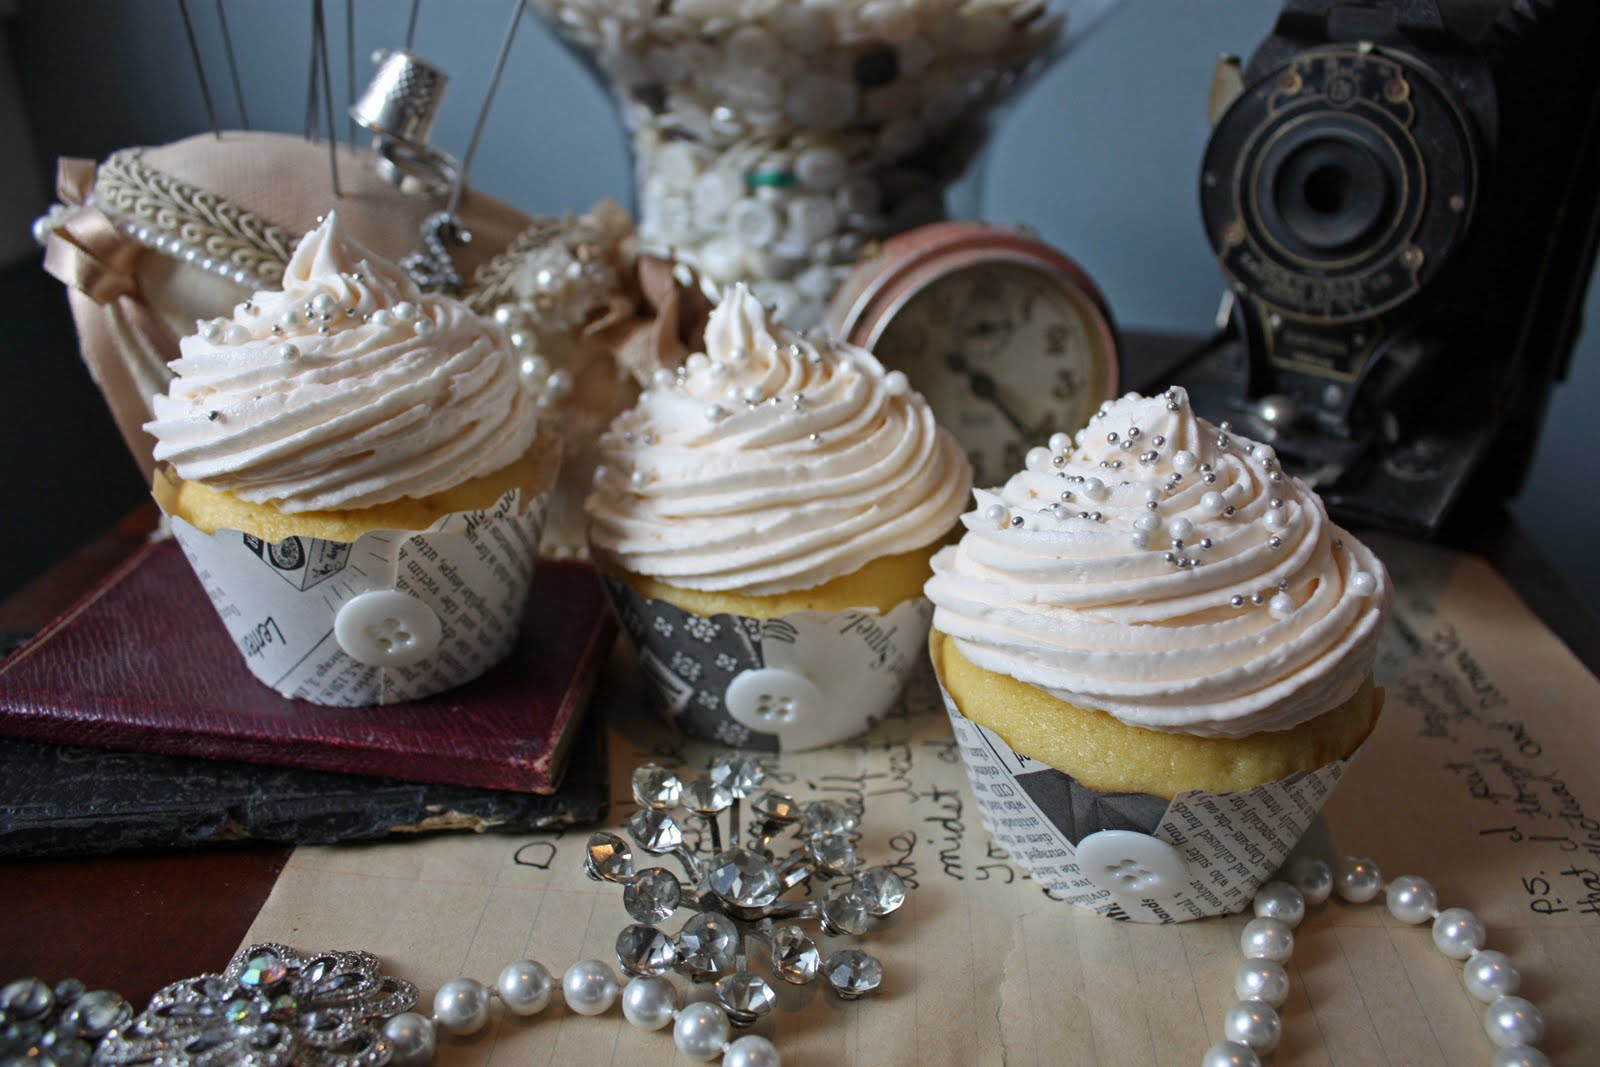 http://2.bp.blogspot.com/_KuaAihD4oVk/S-mu4vGwxnI/AAAAAAAAMws/dI8KPqv6SOU/s1600/vintage-cupcakes.jpg